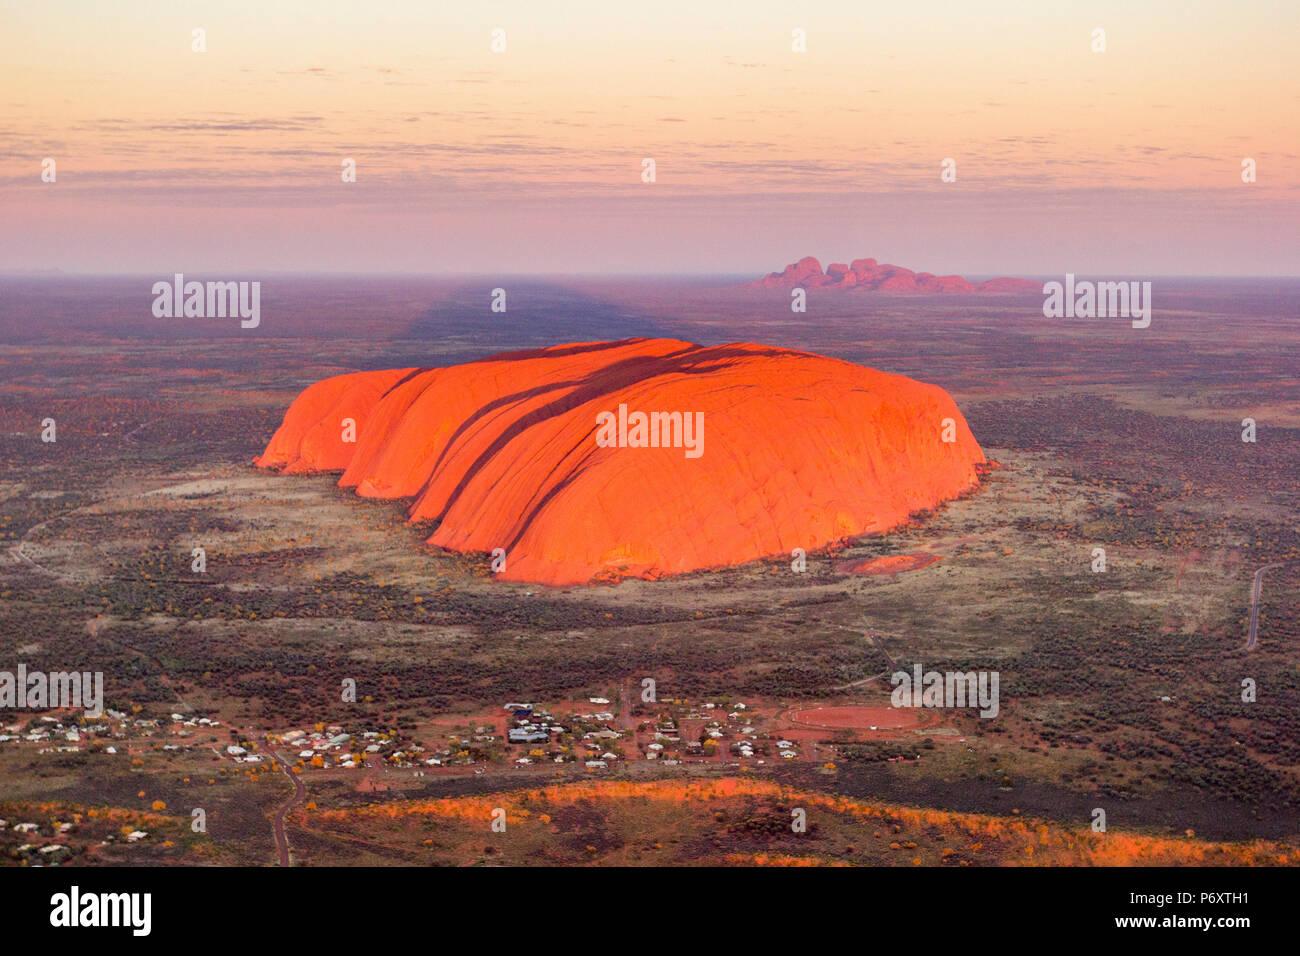 Uluru and Kata Tjuta at sunrise, Aerial view. Northern Territory, Australia - Stock Image